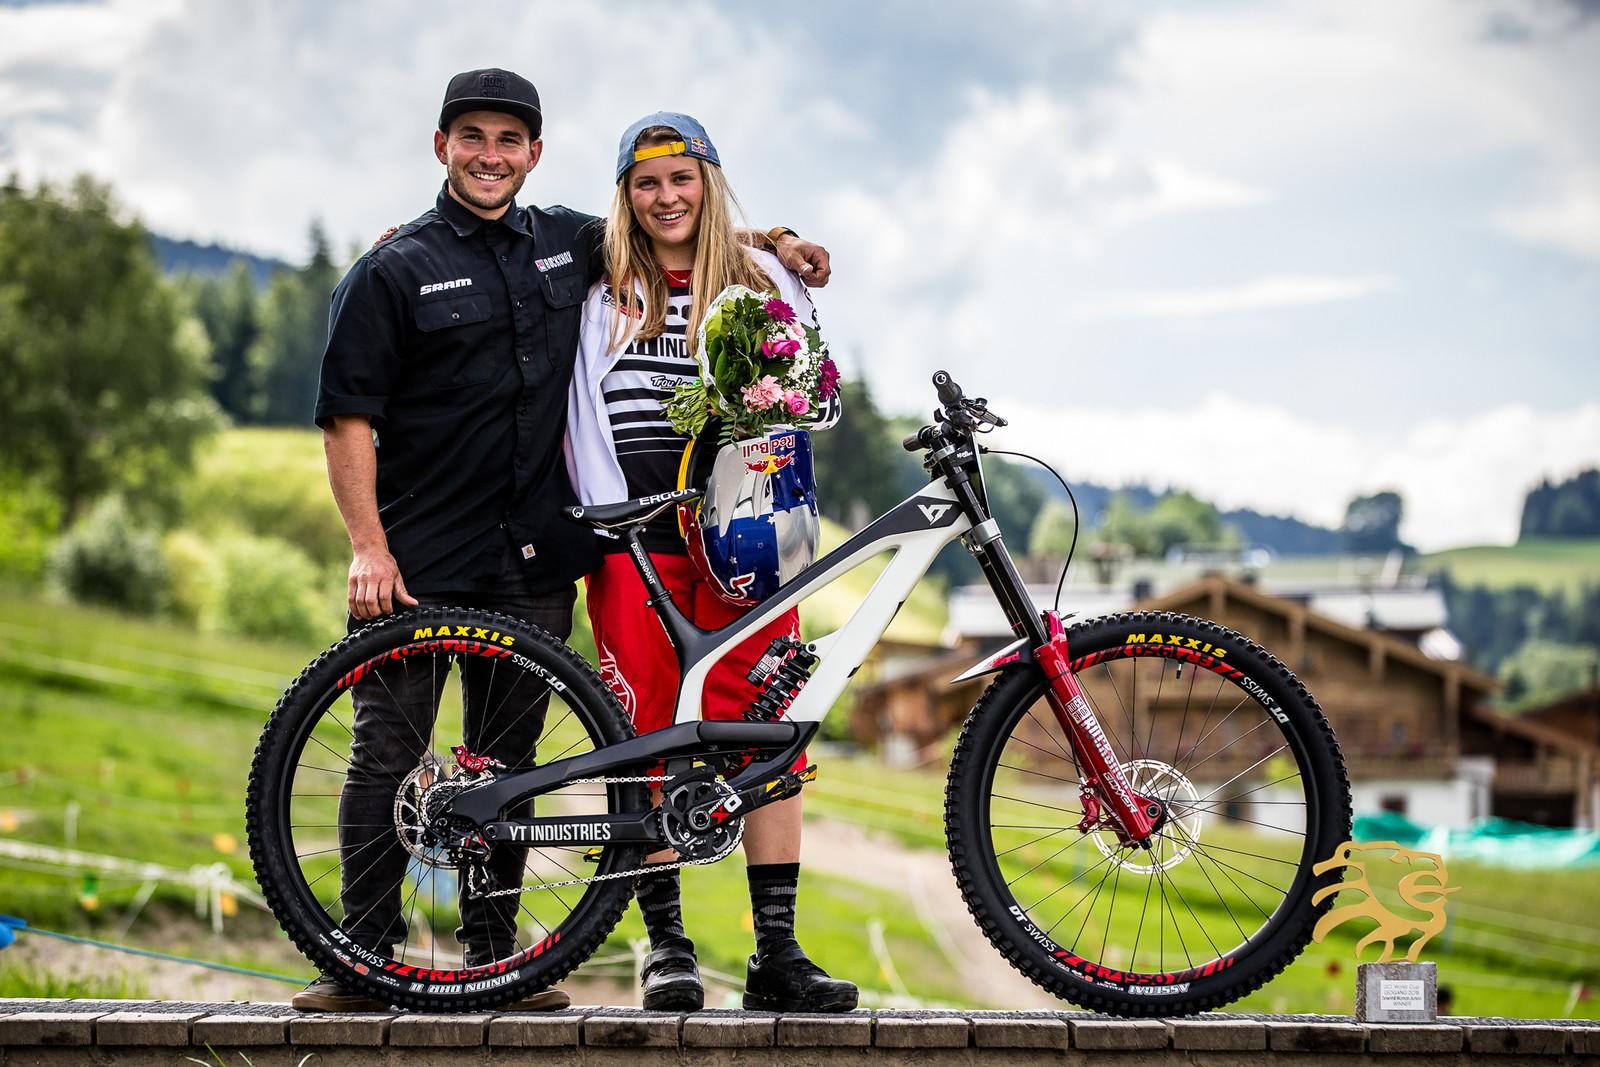 Congrats Vali and Mechanic, Mat Gallean! - WINNING BIKE - Vali Höll's YT TUES - Mountain Biking Pictures - Vital MTB